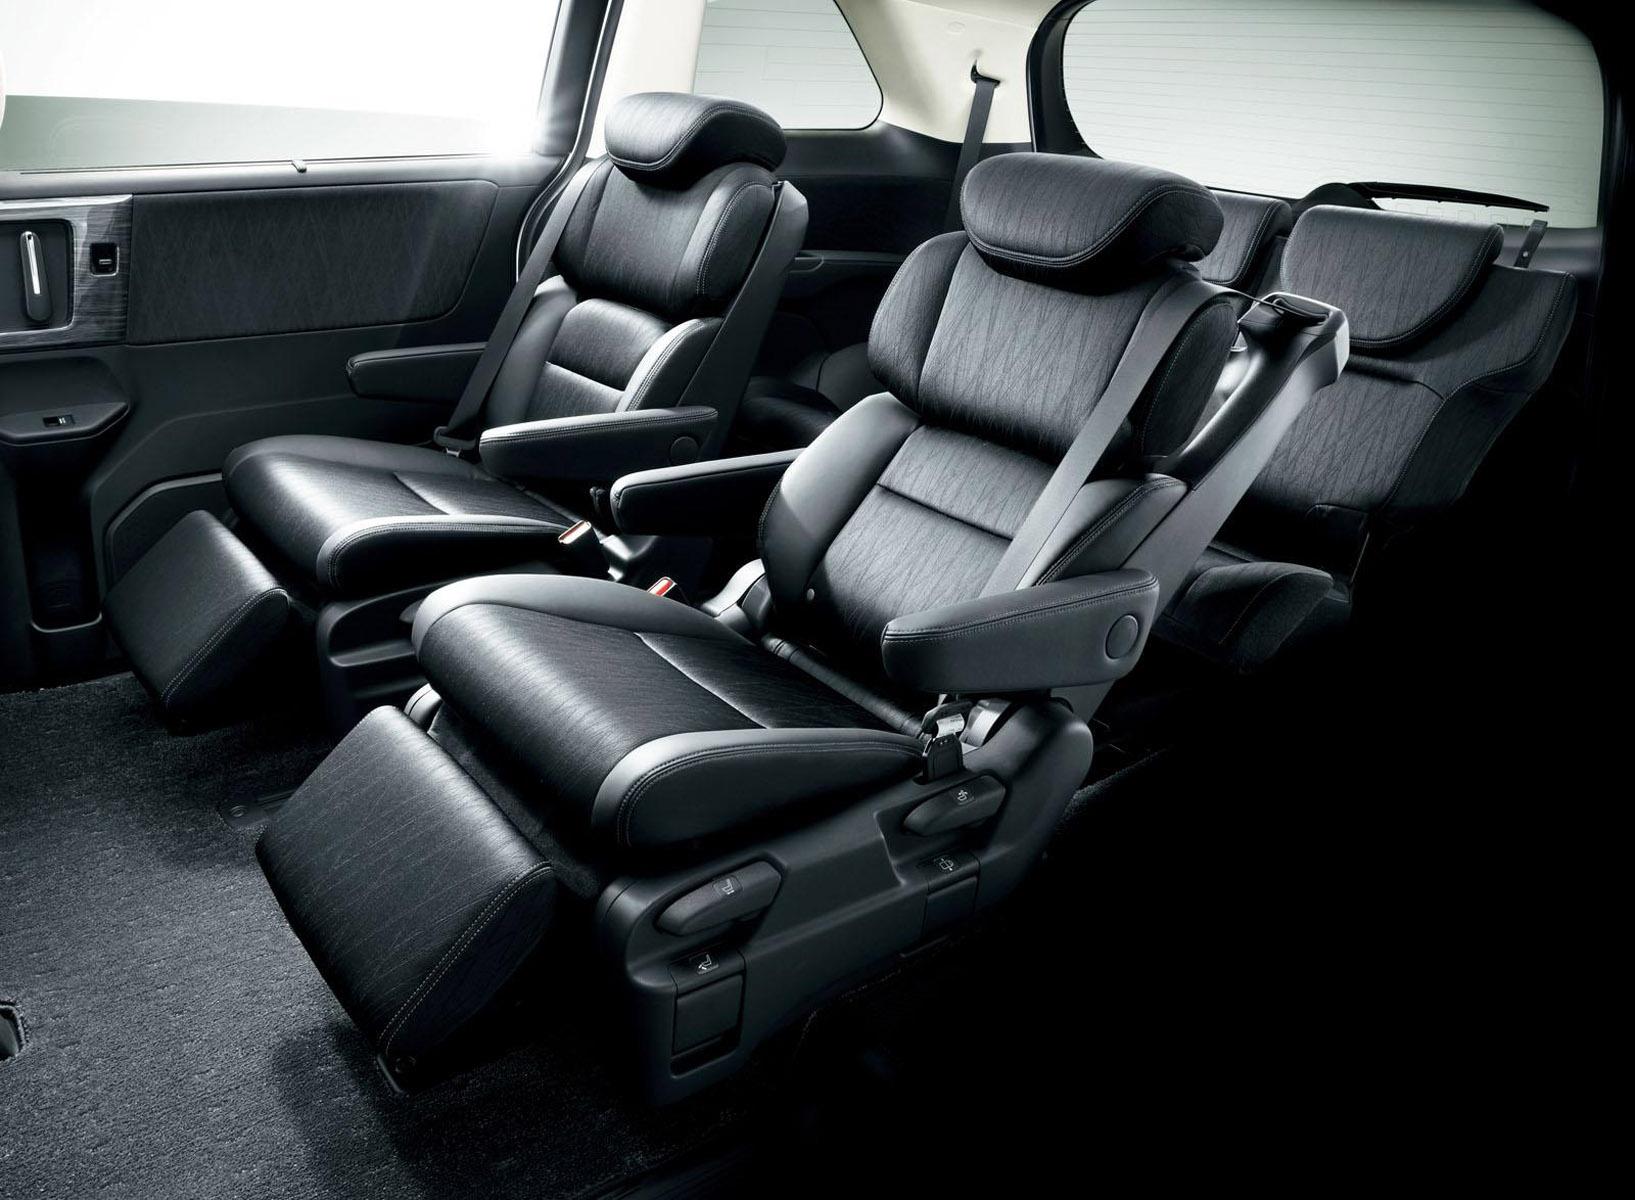 2014 Honda Odyssey Jdm Picture 90799